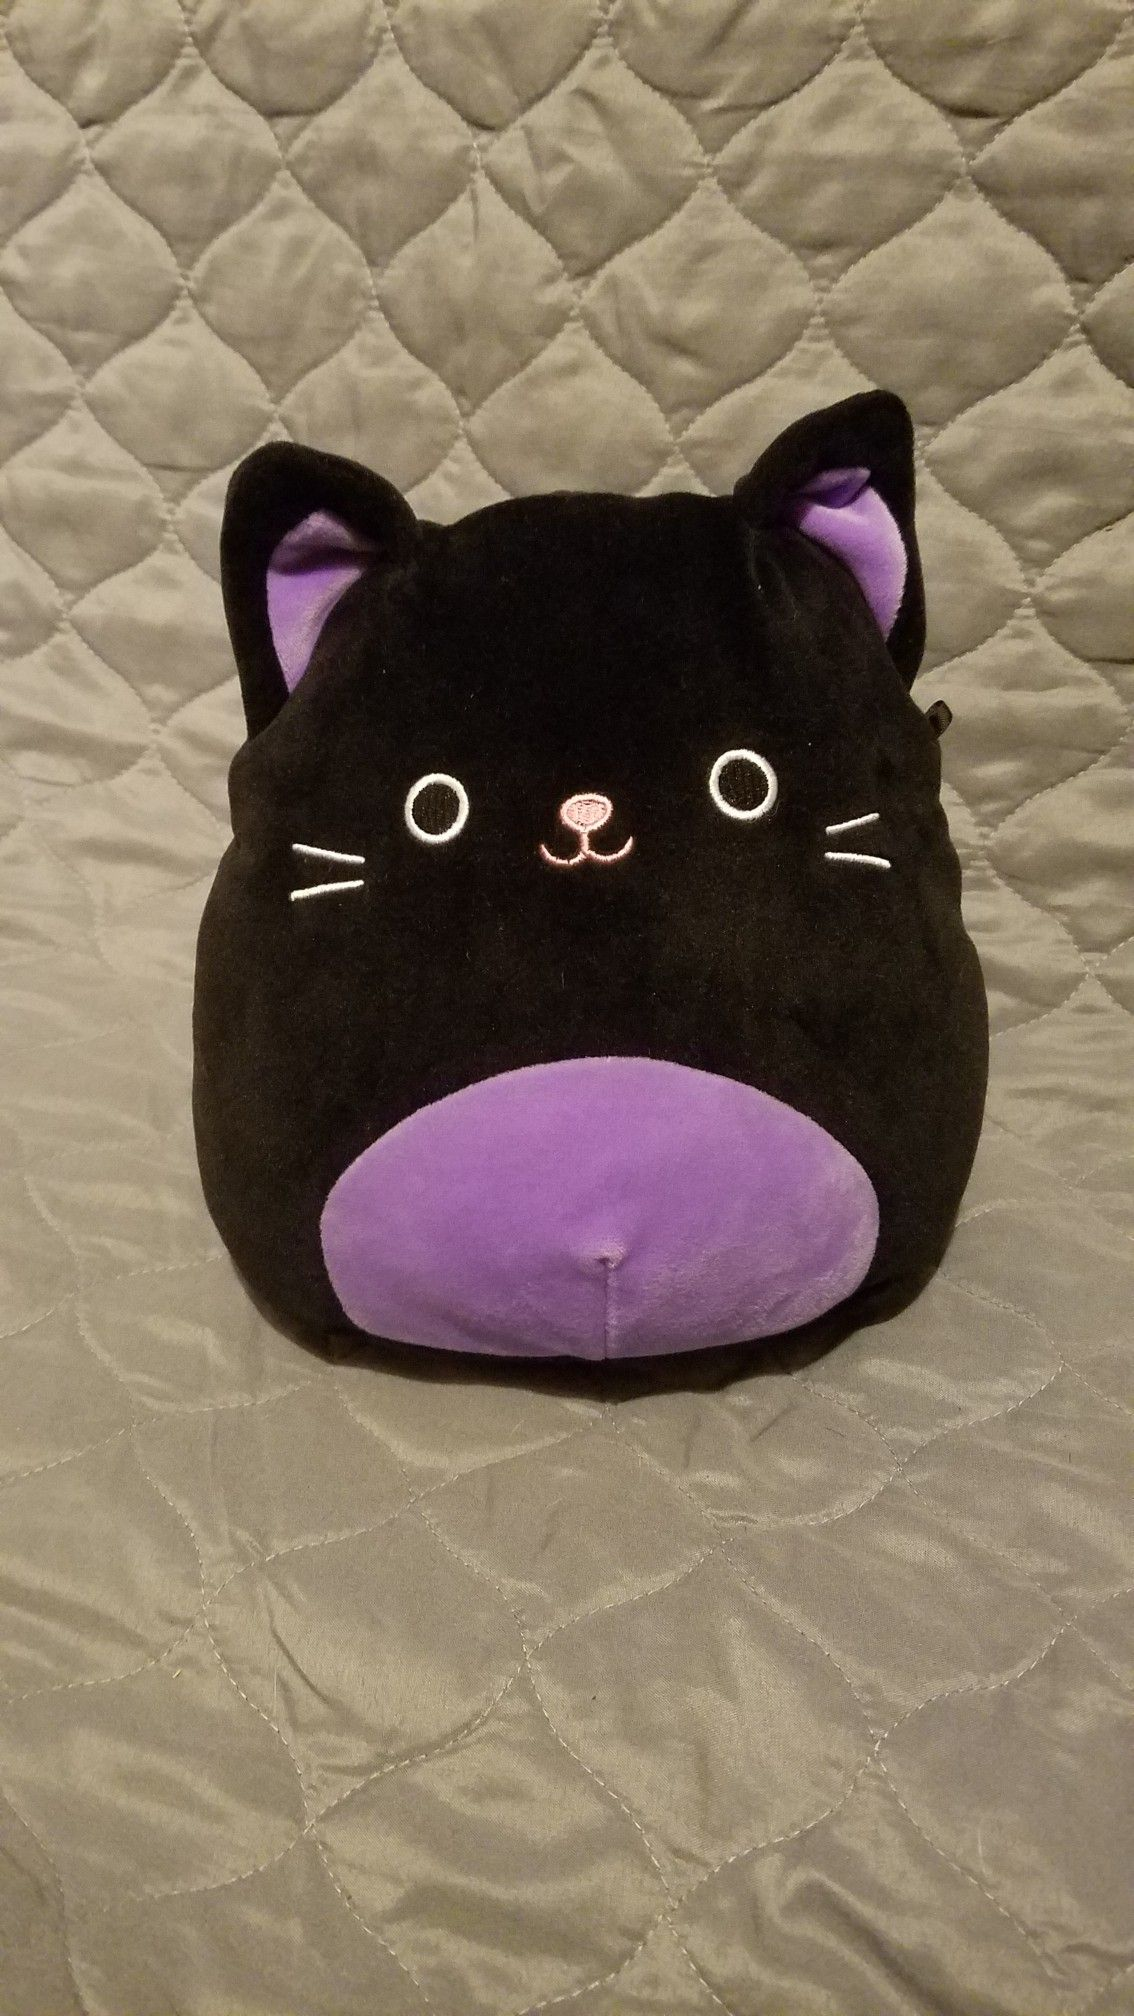 8 Autumn Purple Black Cat Cute Squishies Bra Bags Purple And Black